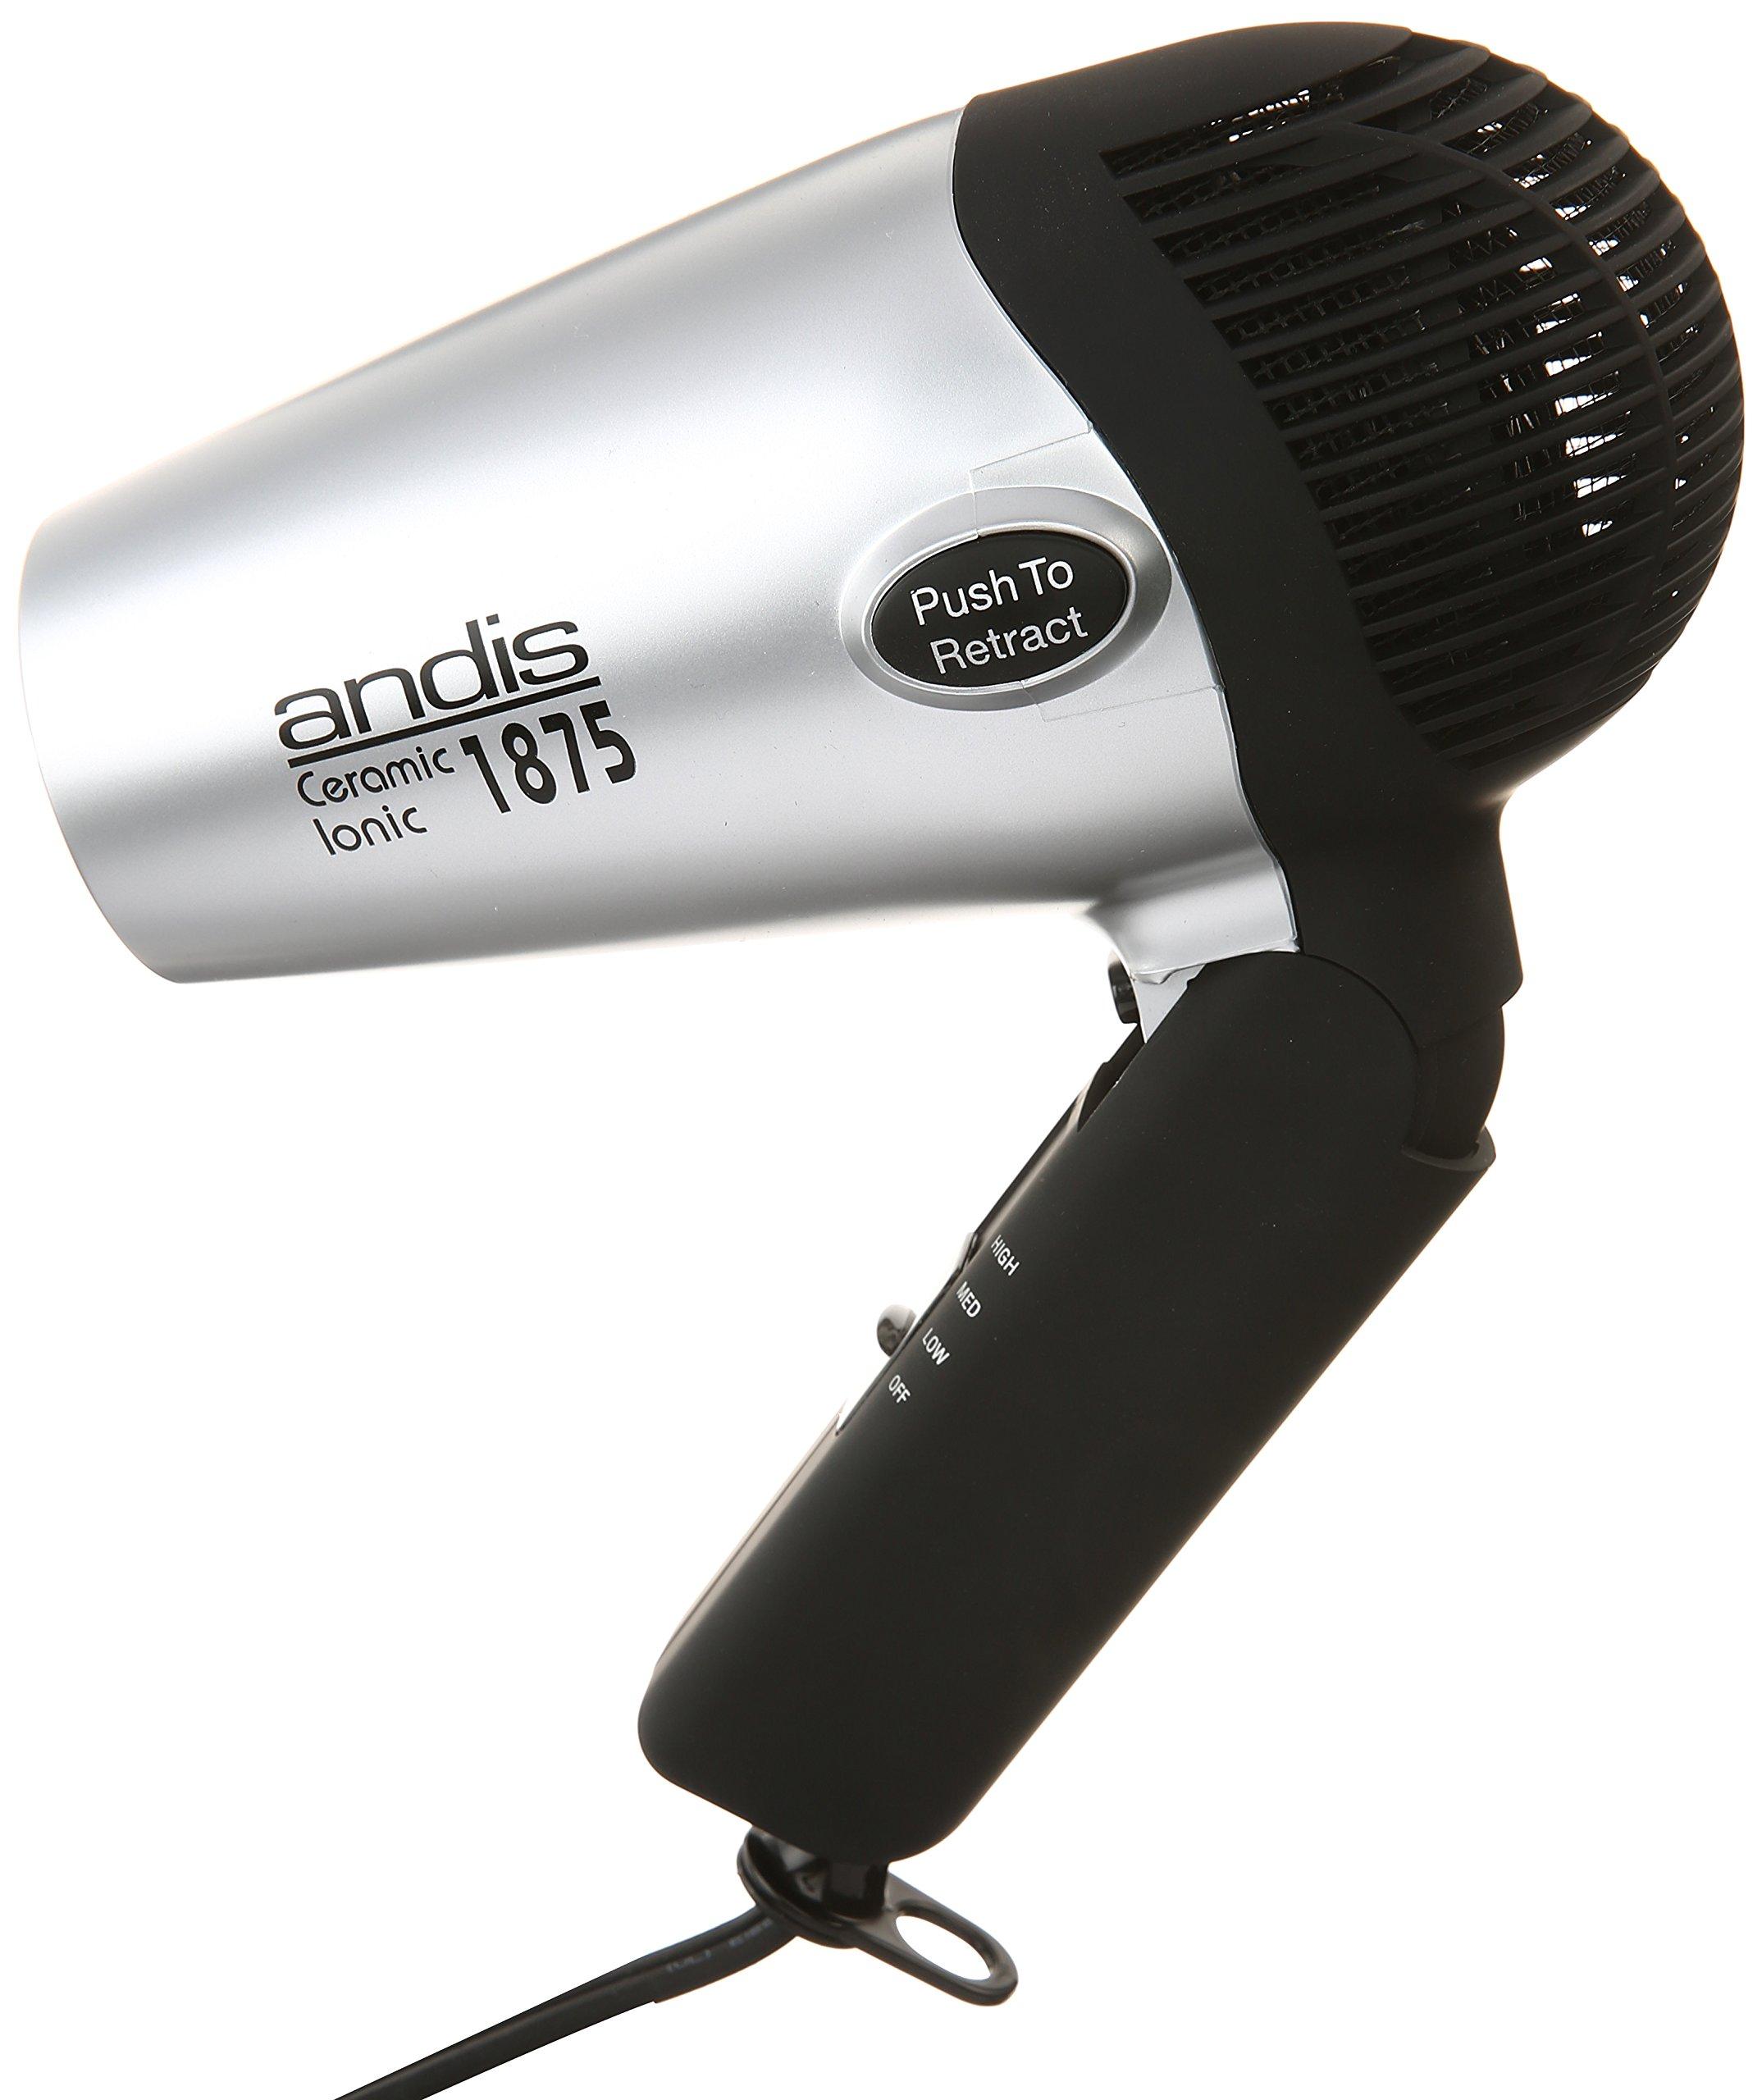 Ionic Hair Dryer ~ Andis watt fold n go ionic hair dryer foldable